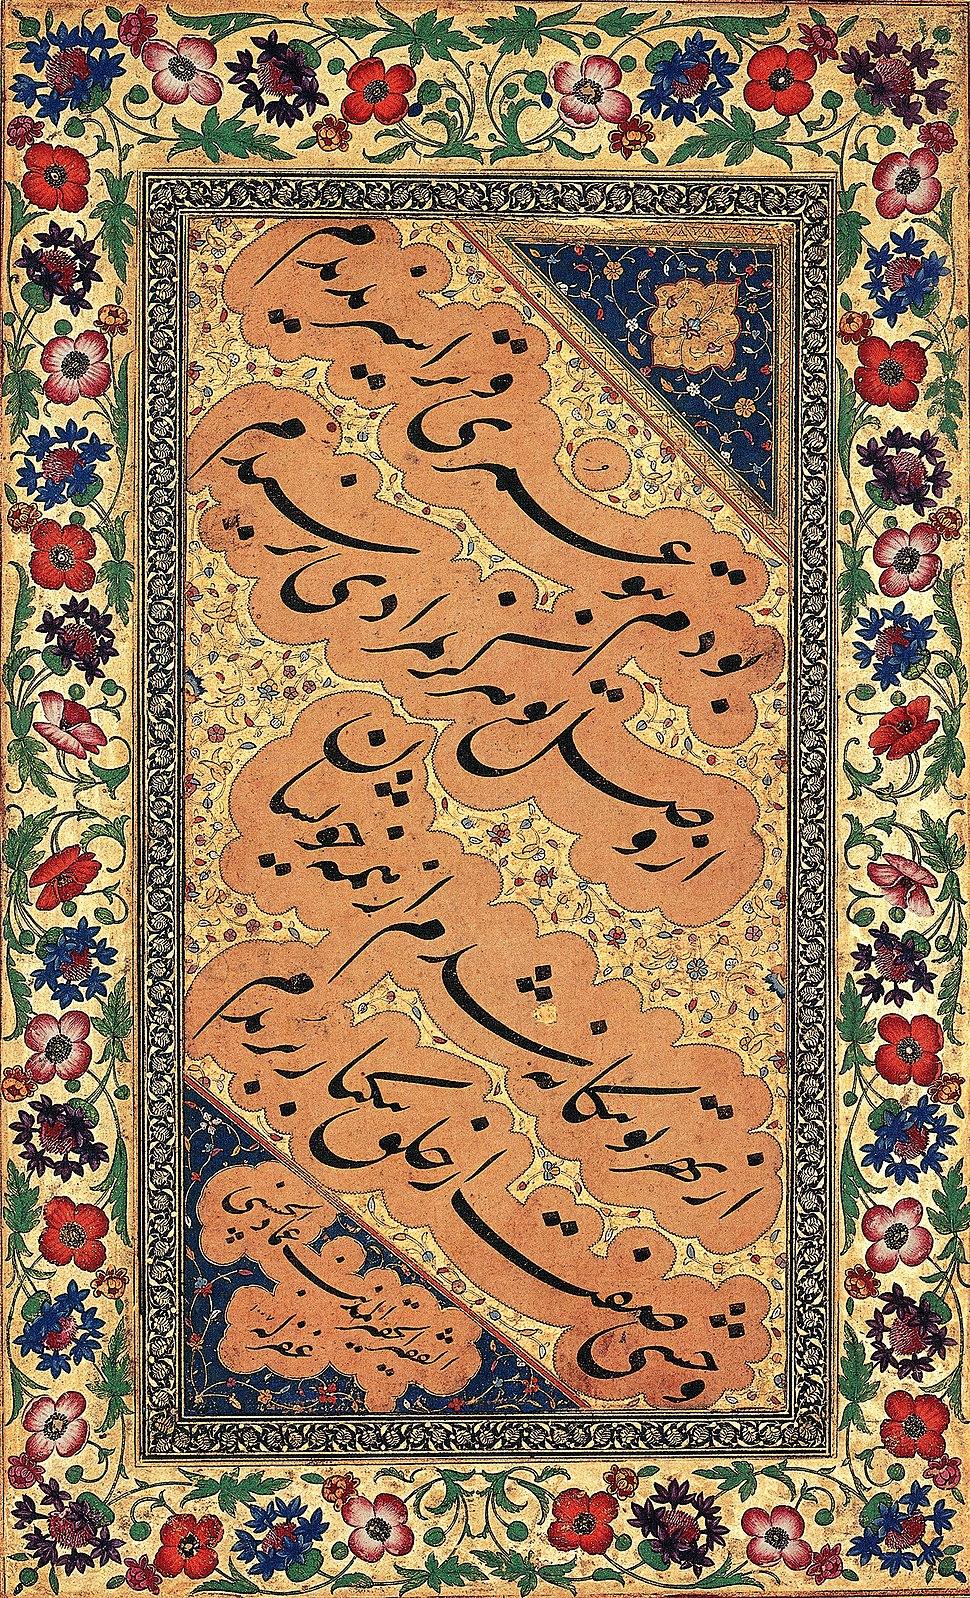 Persian calligraphy - Howling Pixel